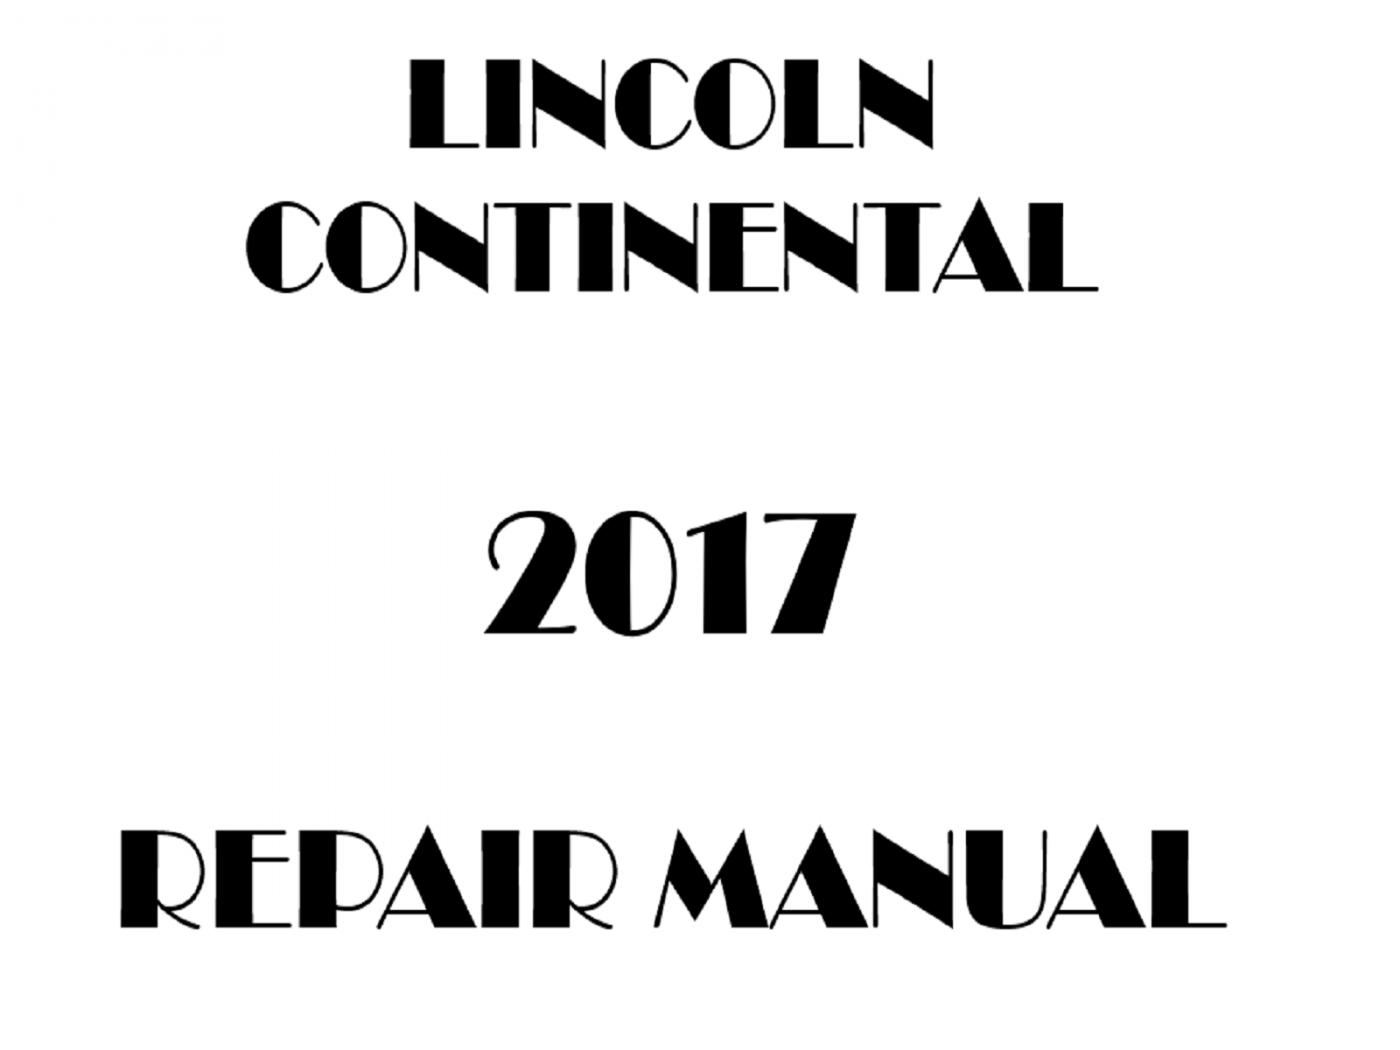 2017 Lincoln Continental Repair Manual